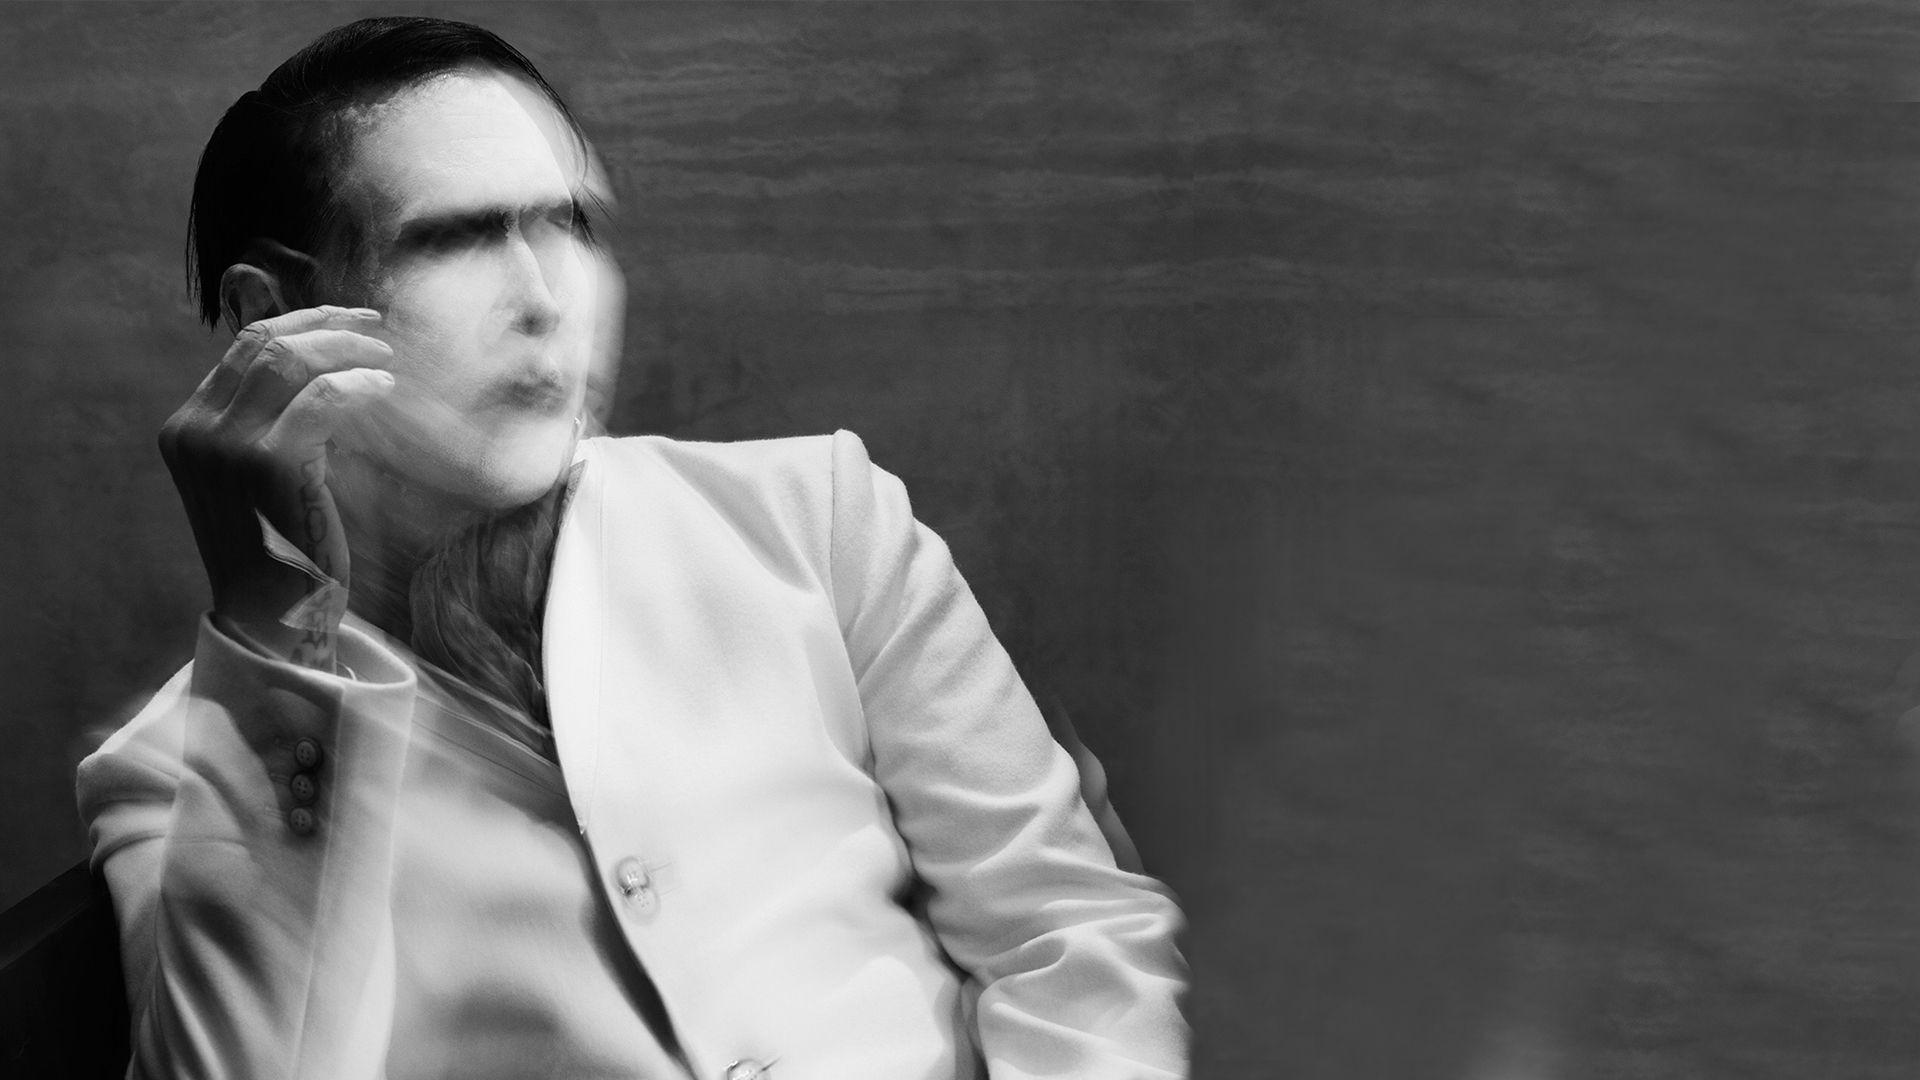 Marilyn Manson – The Pale Emperor Wallpaper by composur3 on DeviantArt